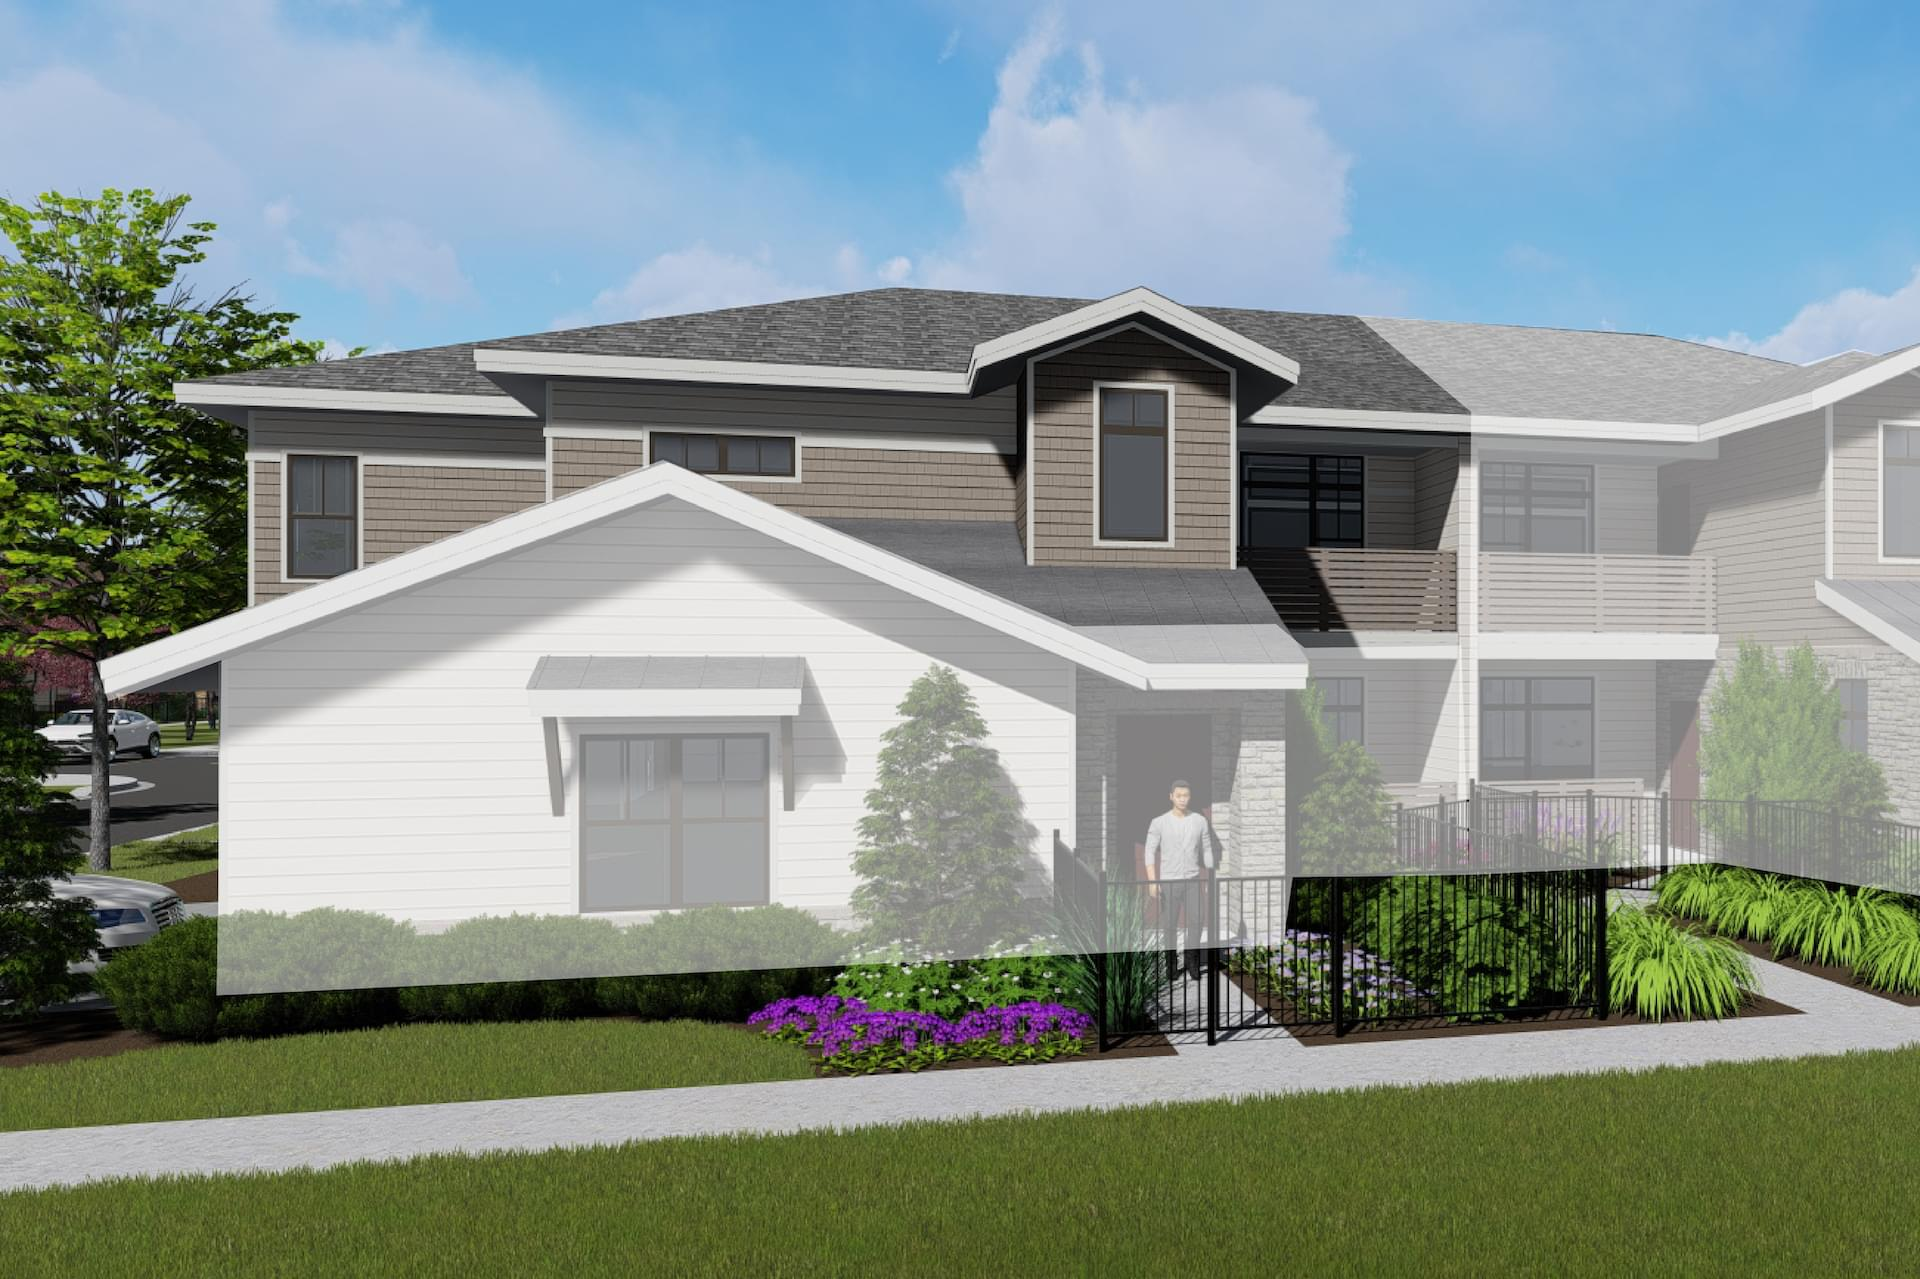 3br New Home in Loveland, CO